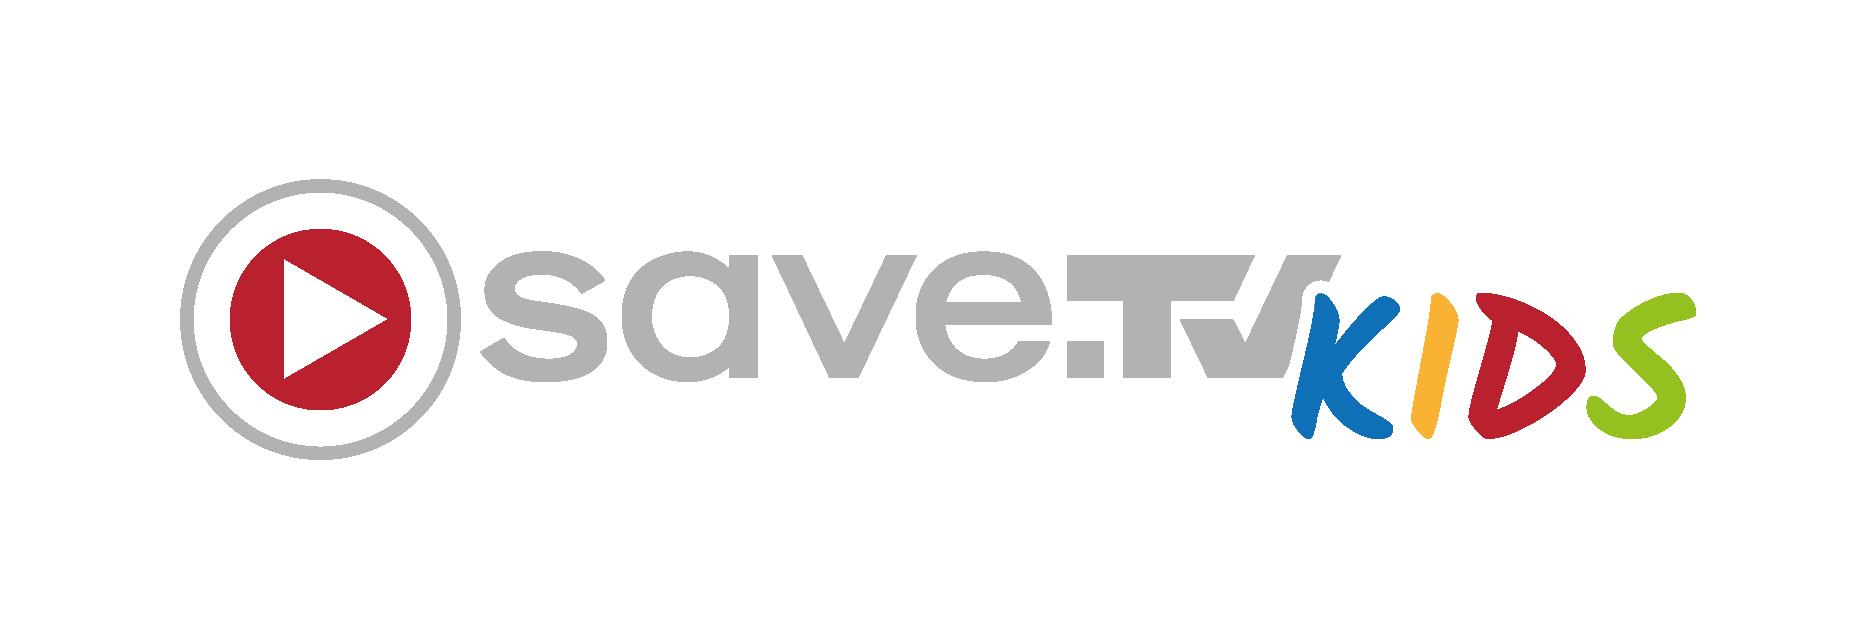 B-916310_save-tv-logo-bunt